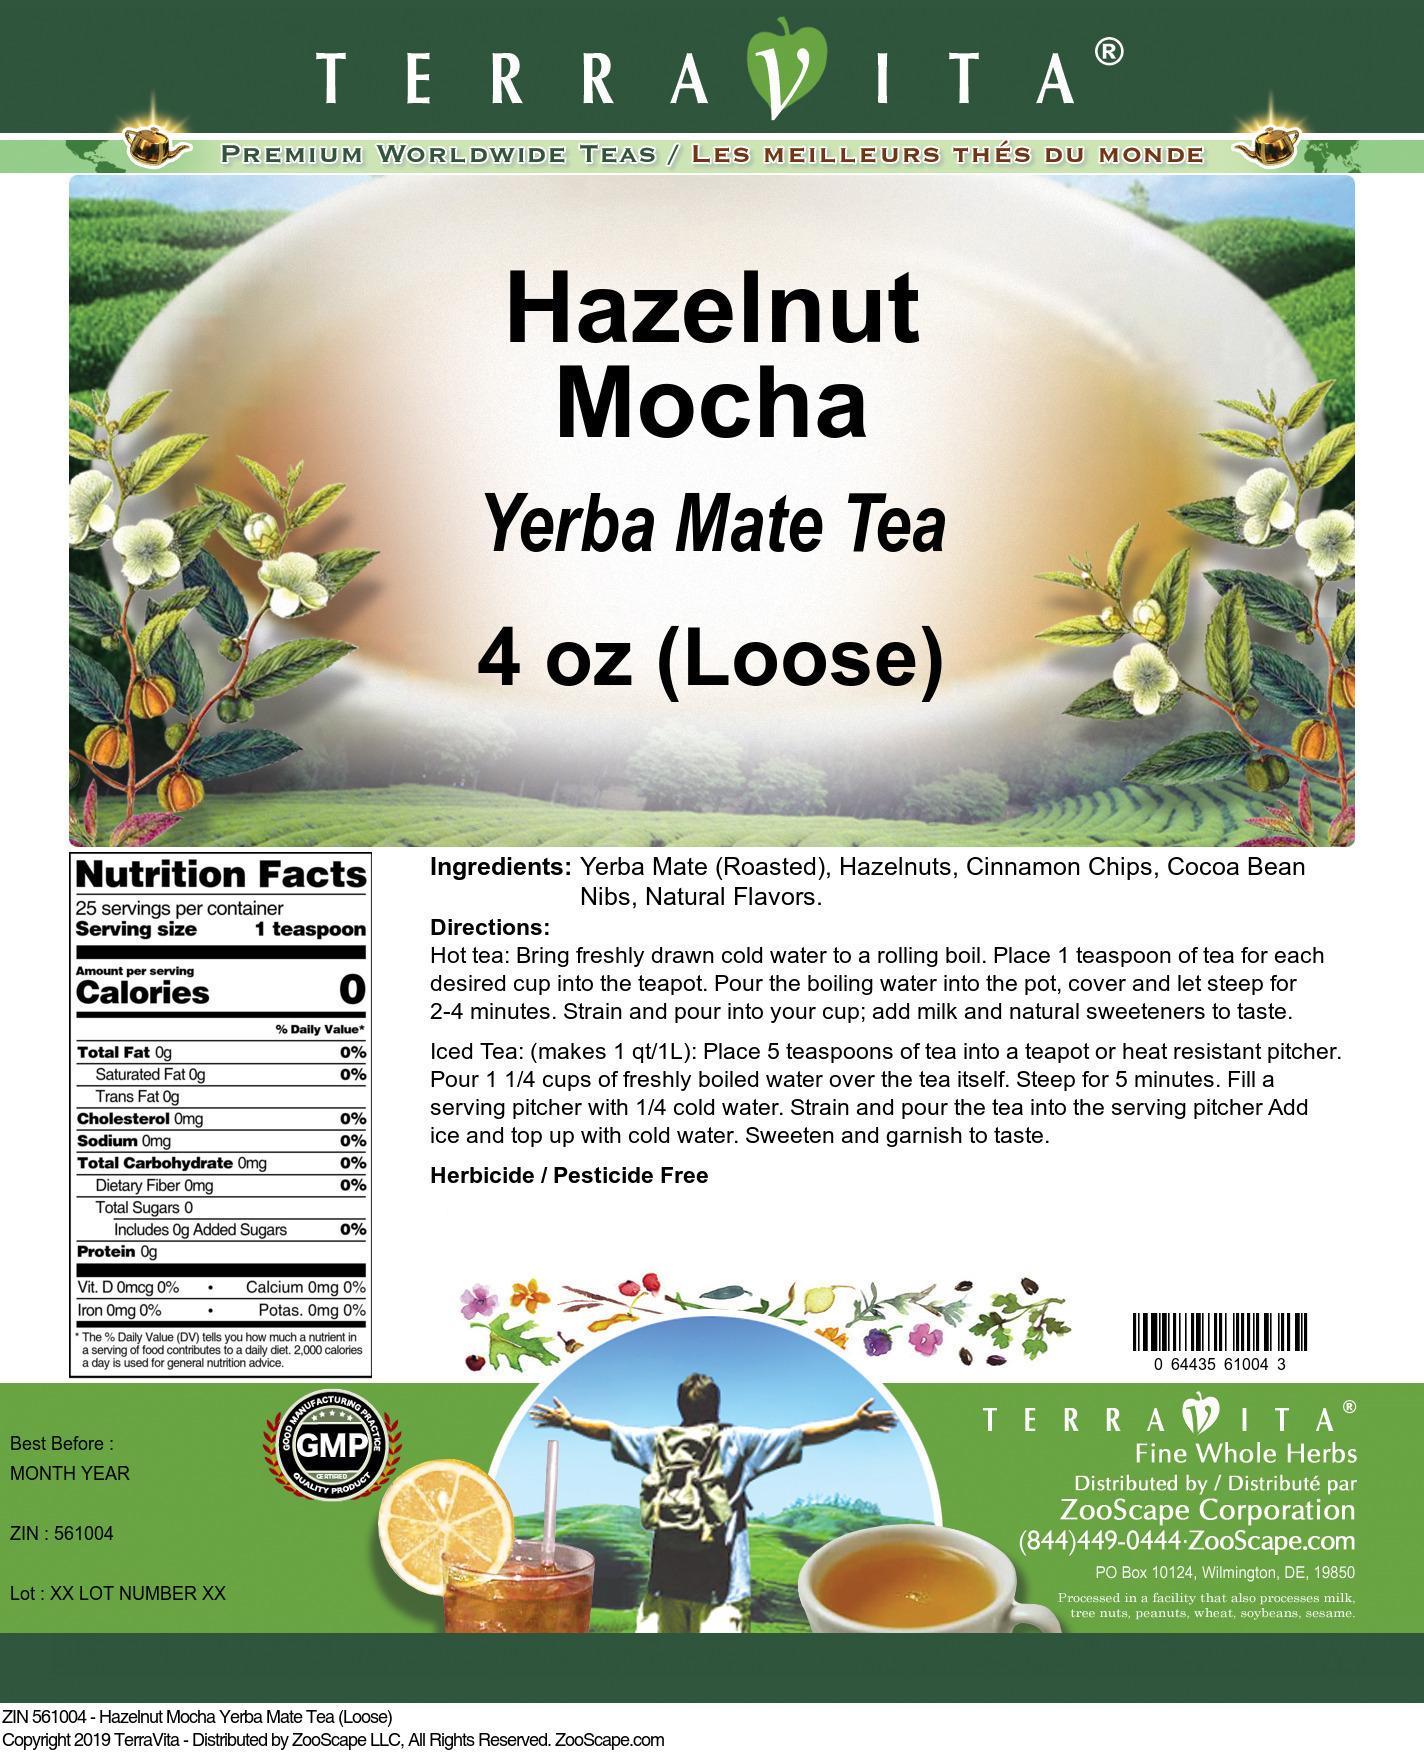 Hazelnut Mocha Yerba Mate Tea (Loose)